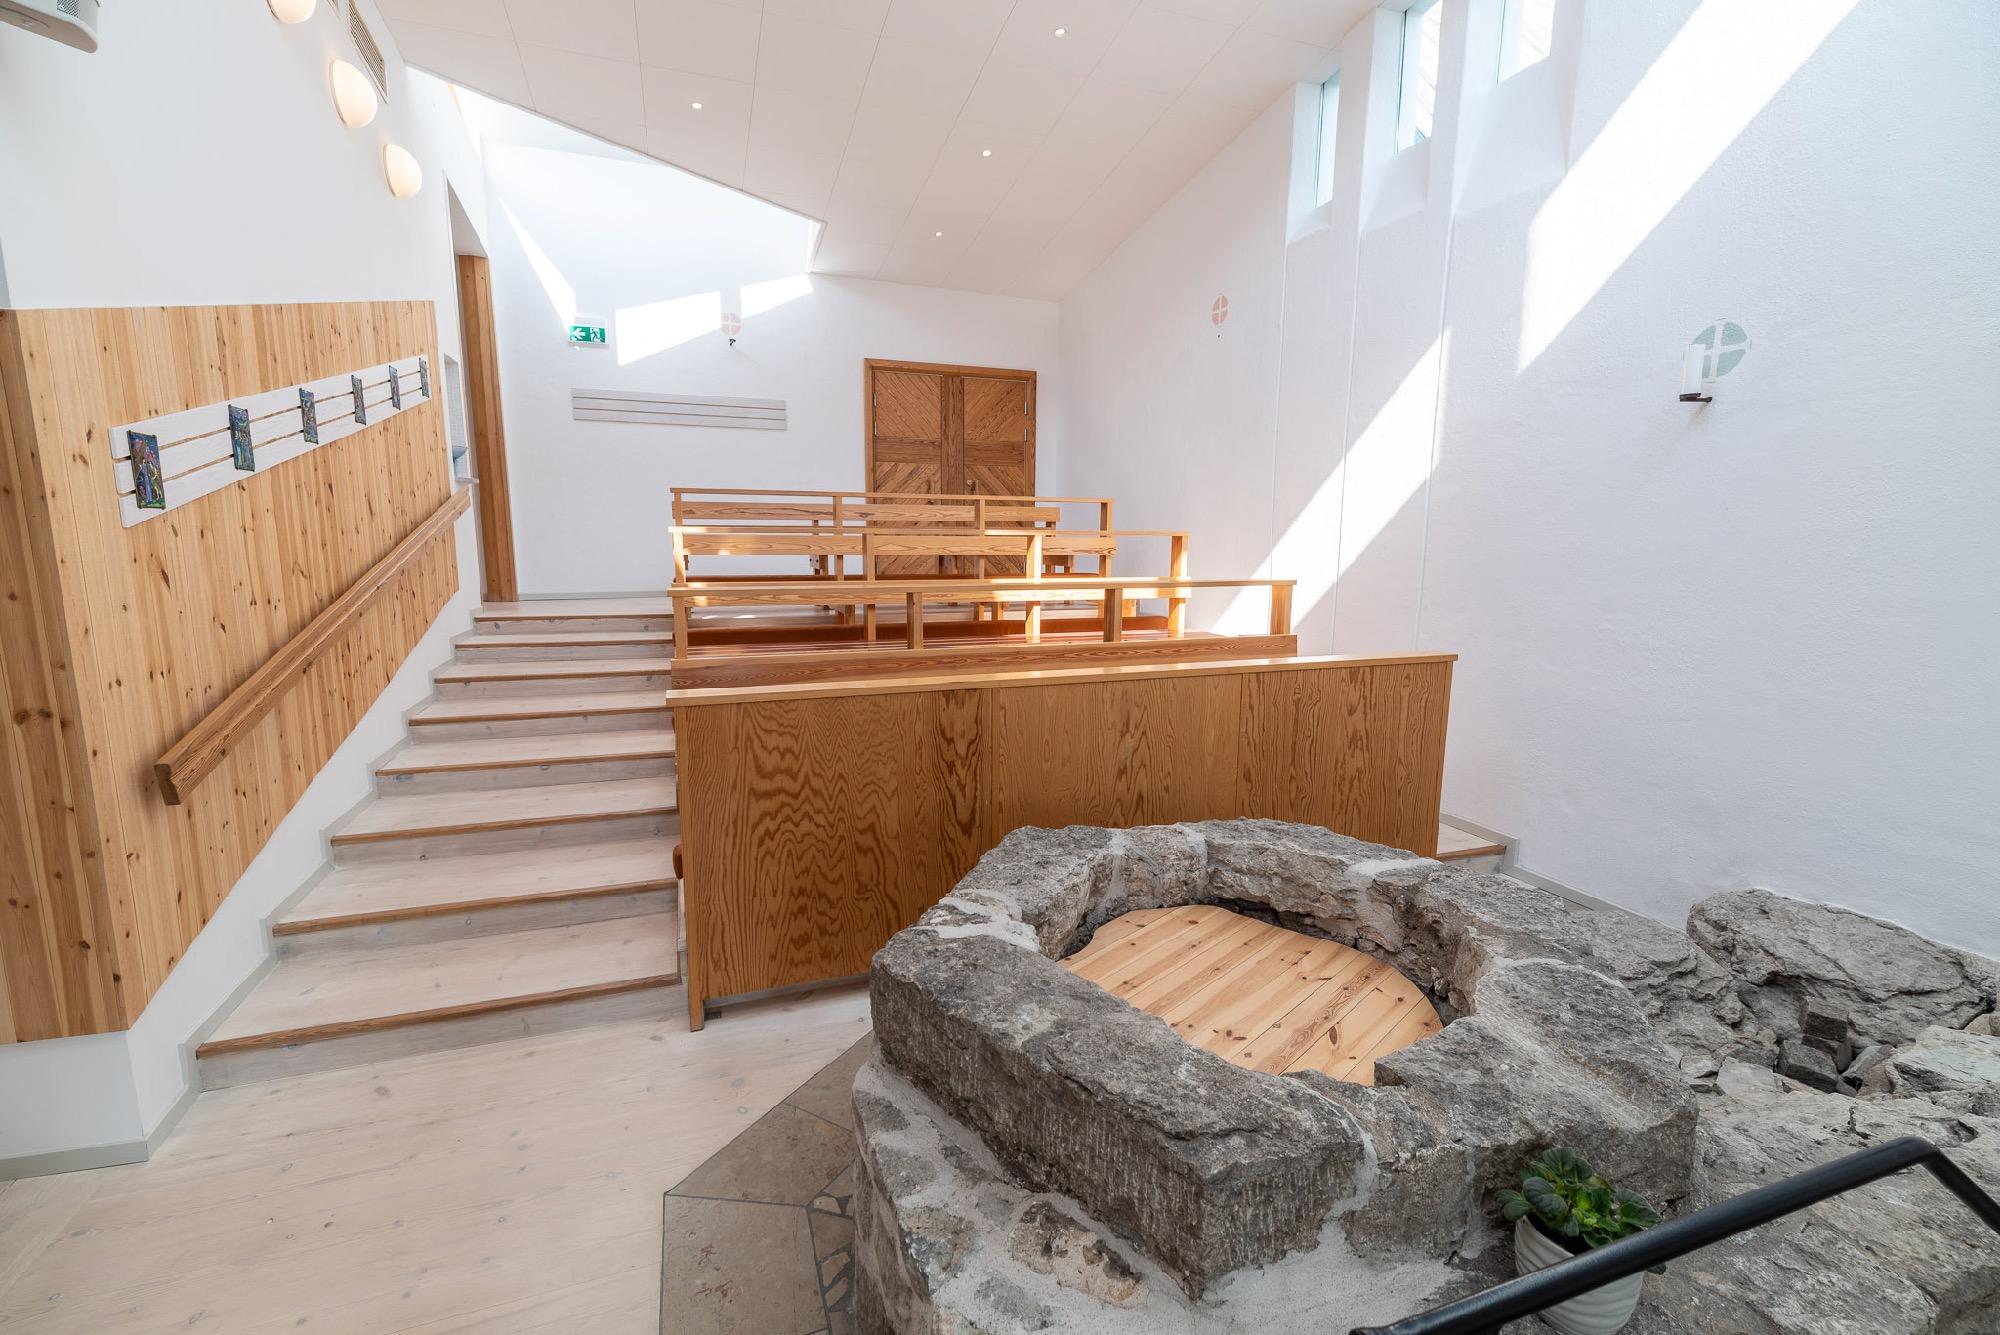 Katolska kyrkan, Visby 14